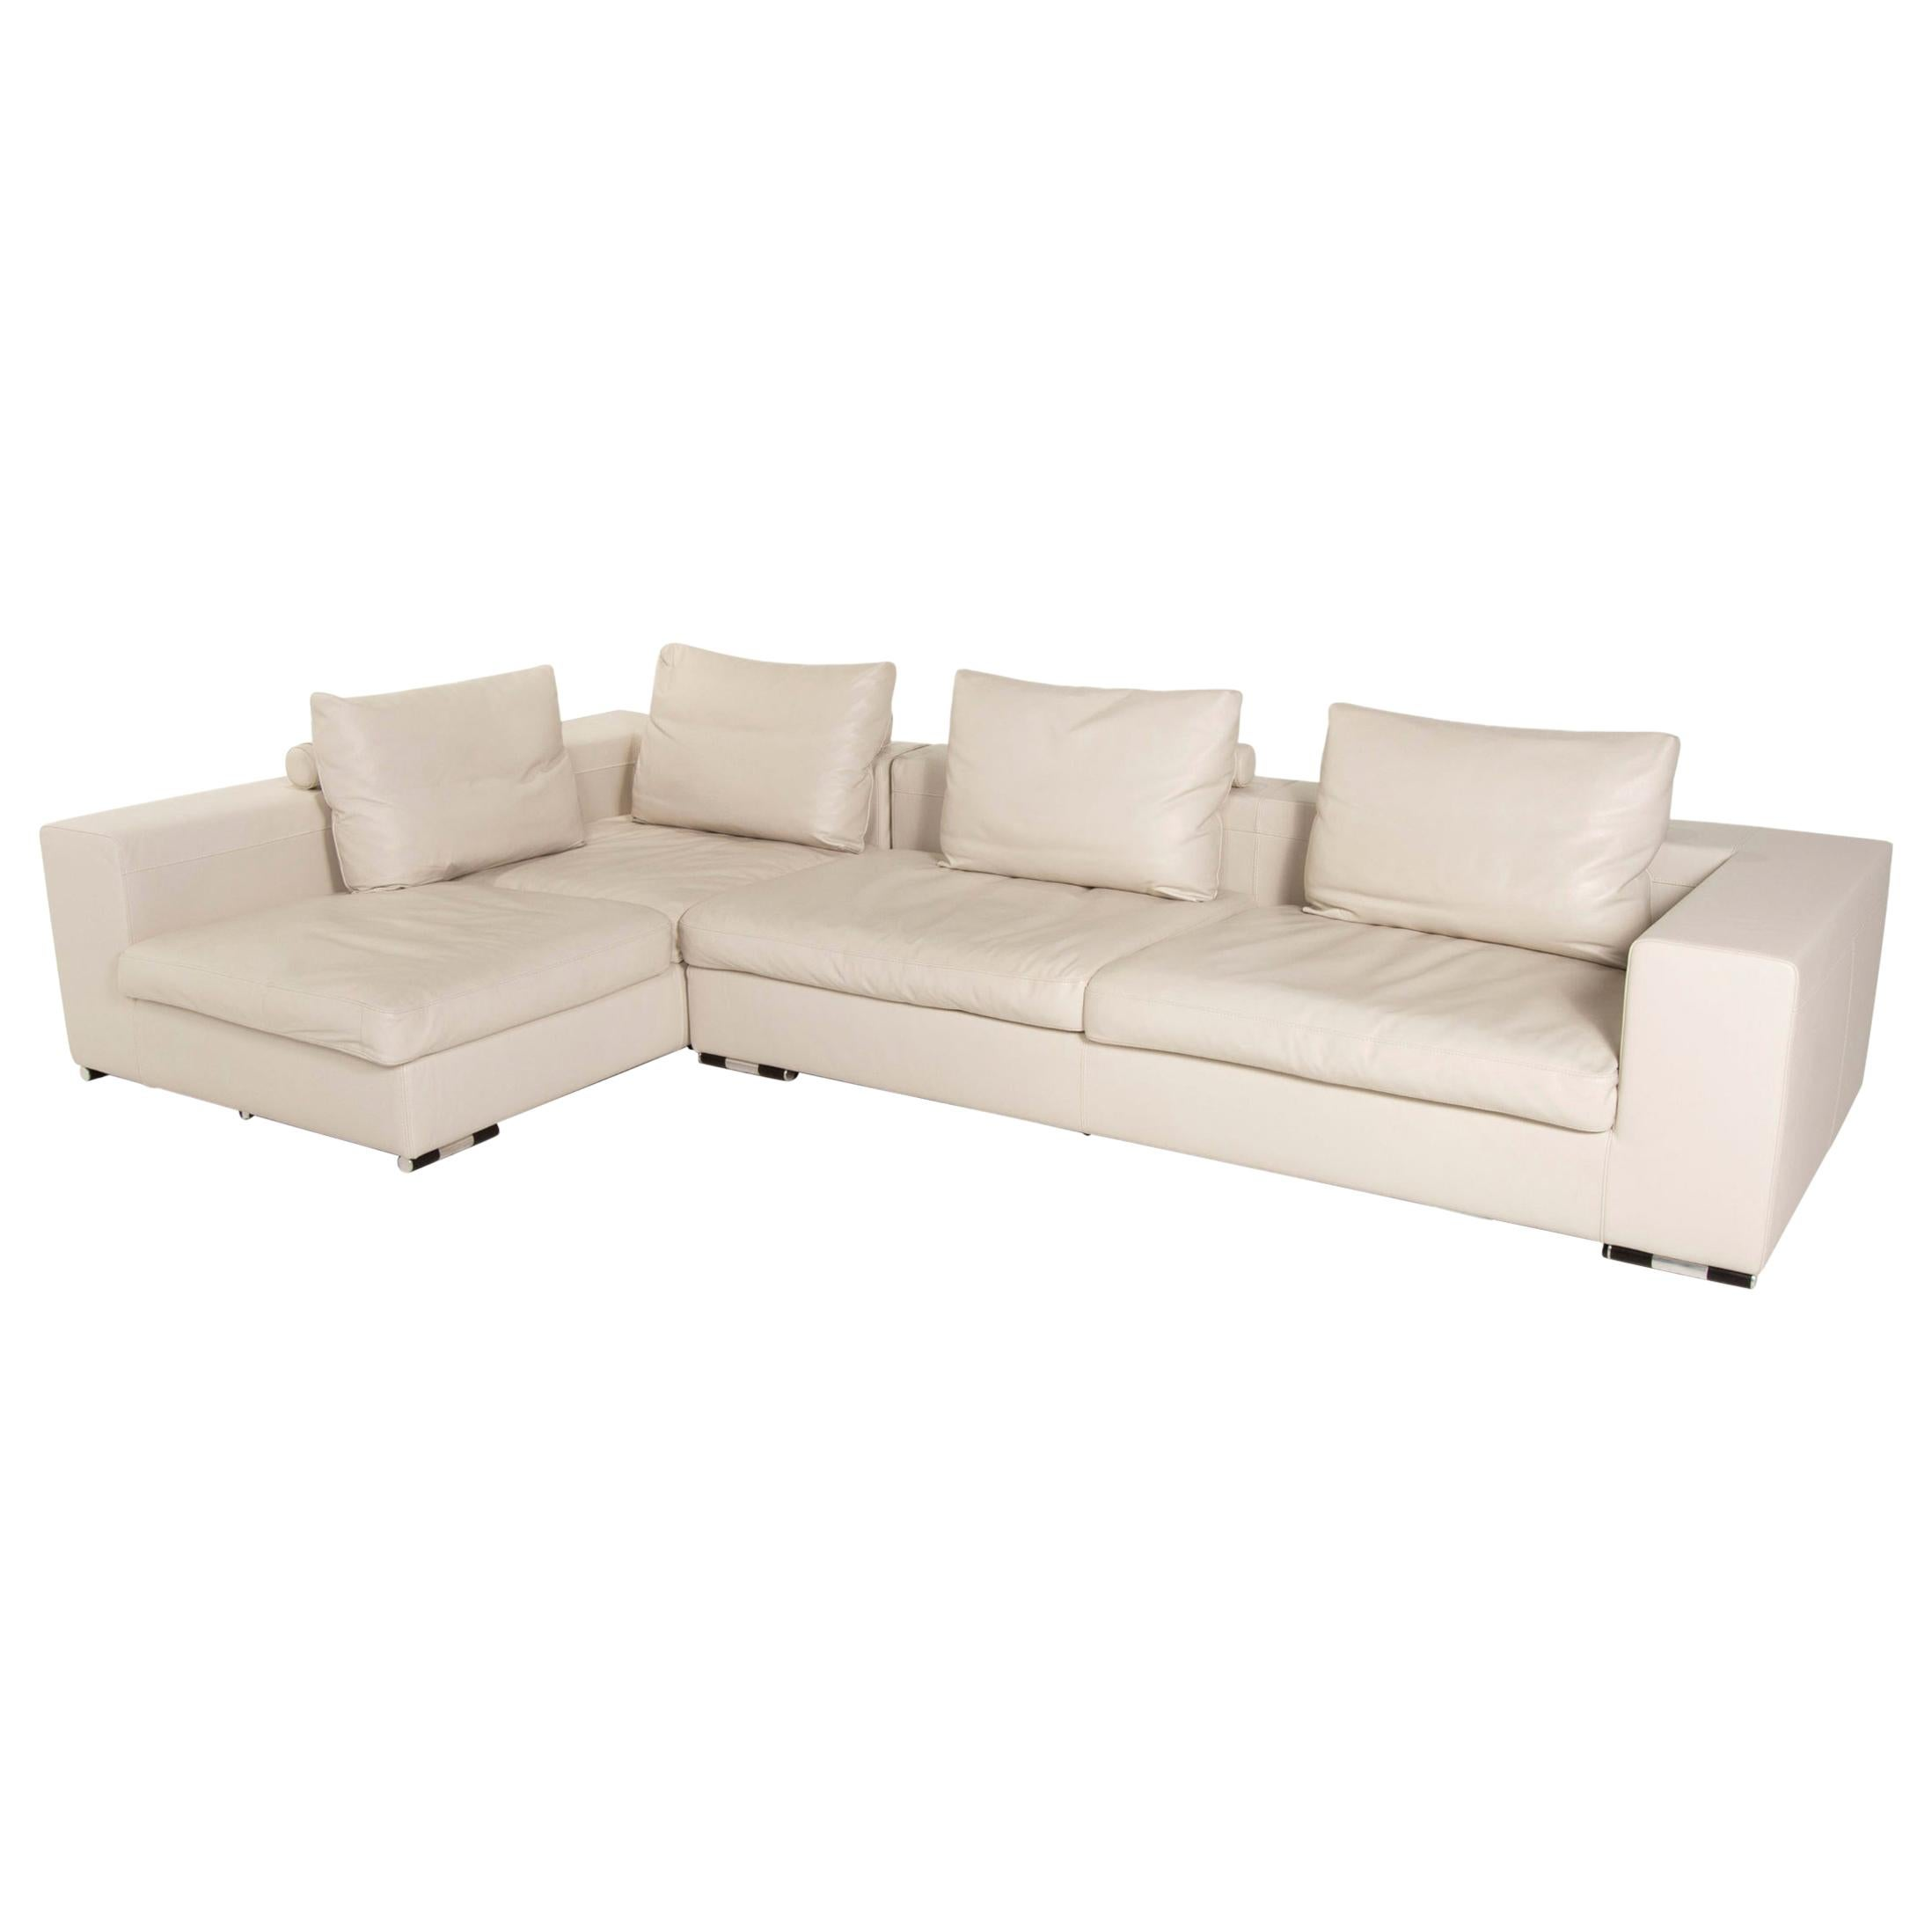 Who's Perfect Creme Leather Corner Sofa